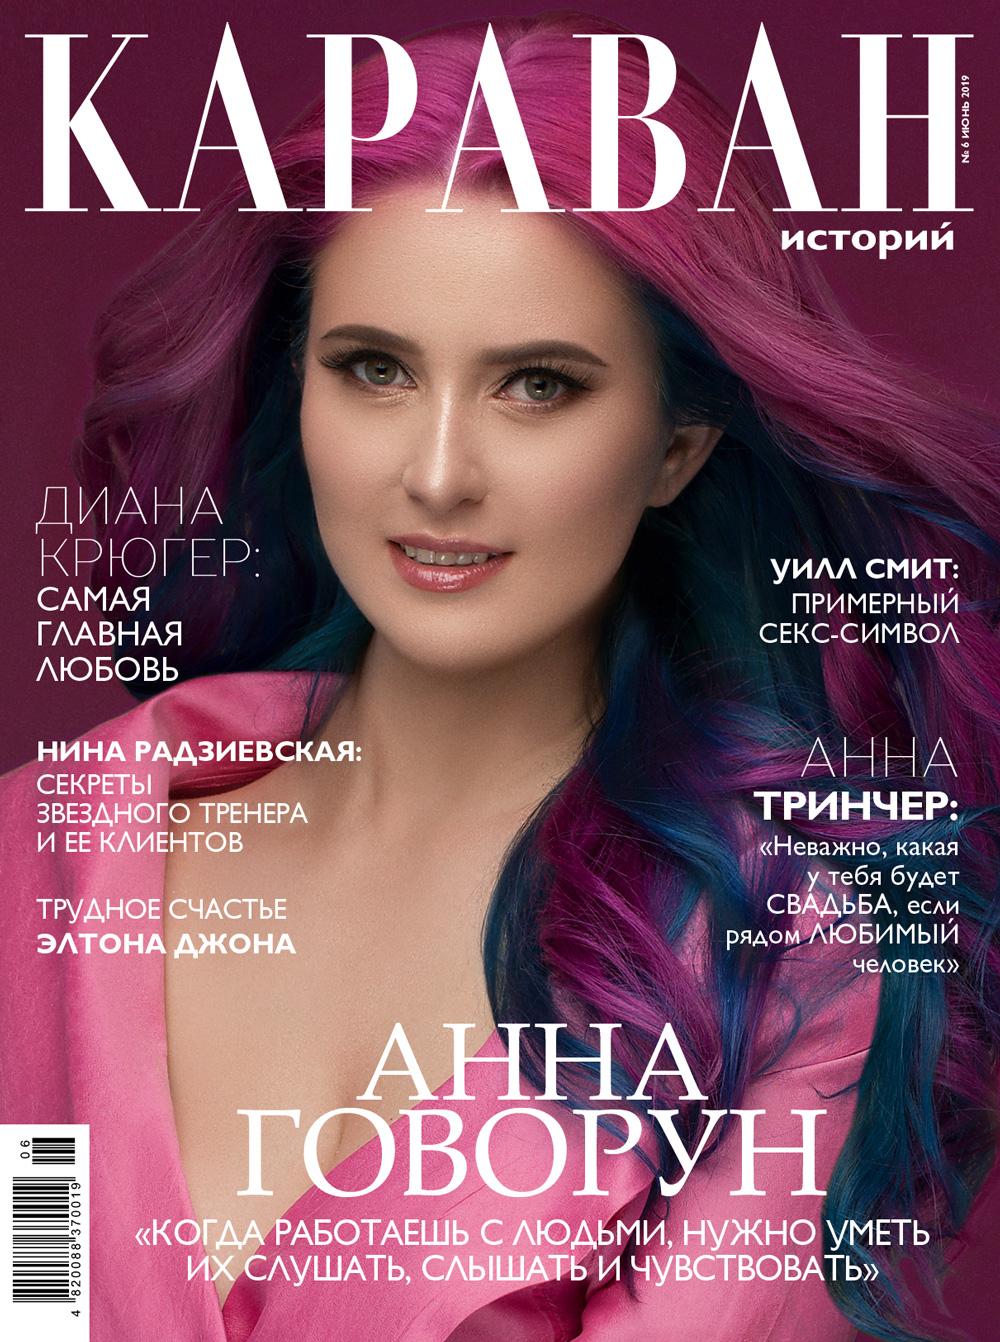 """Караван историй"", июнь 2019"